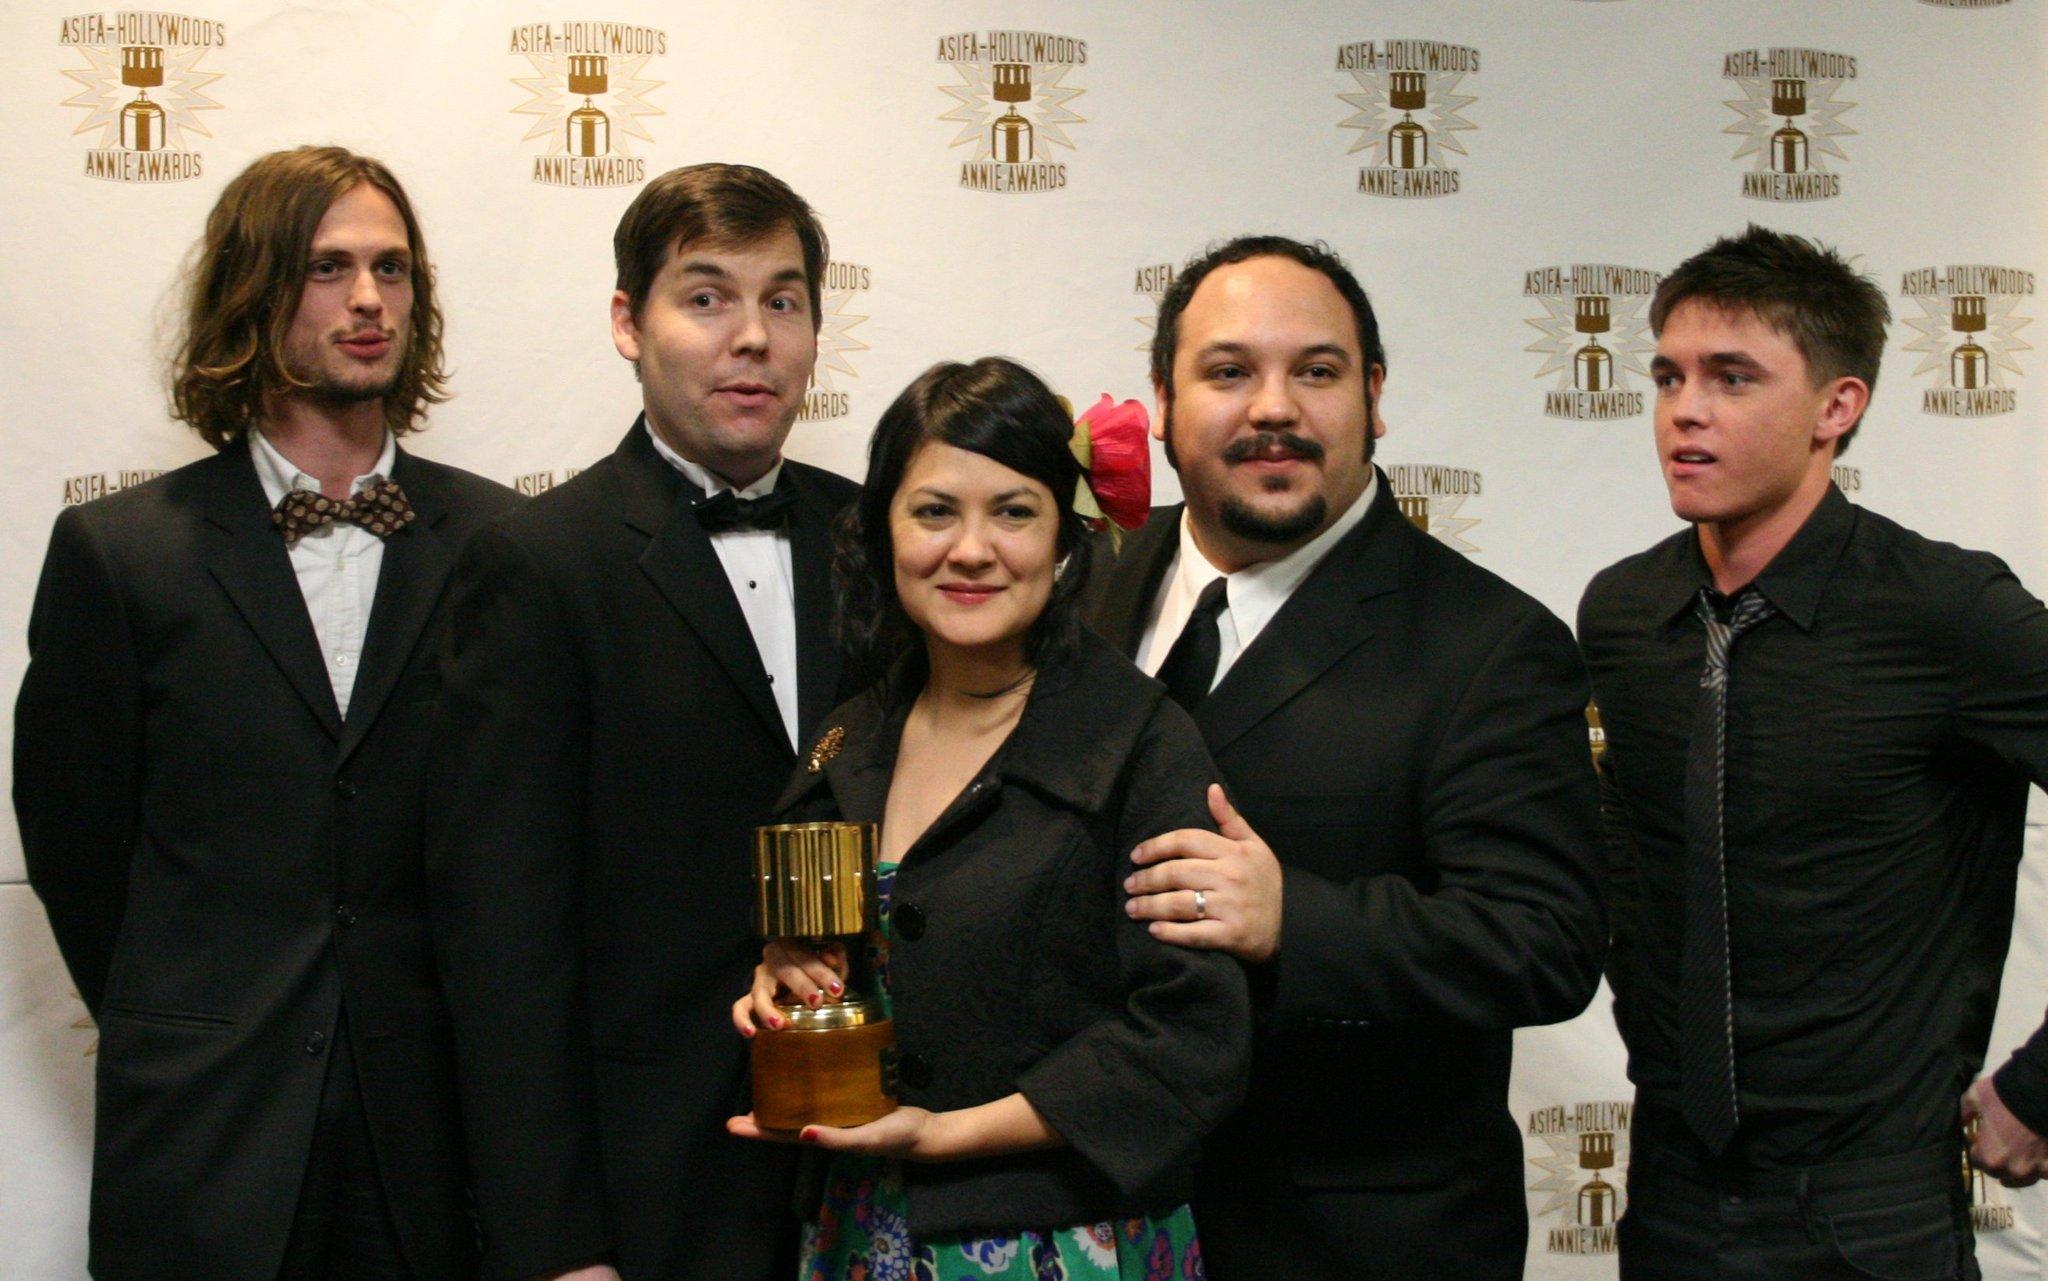 Presenters Matthew Gray Gubler and Jesse McCartney flank Dave Thomas, Sandra Equihua, and Jorge Gutierrez, winners for best children's TV production